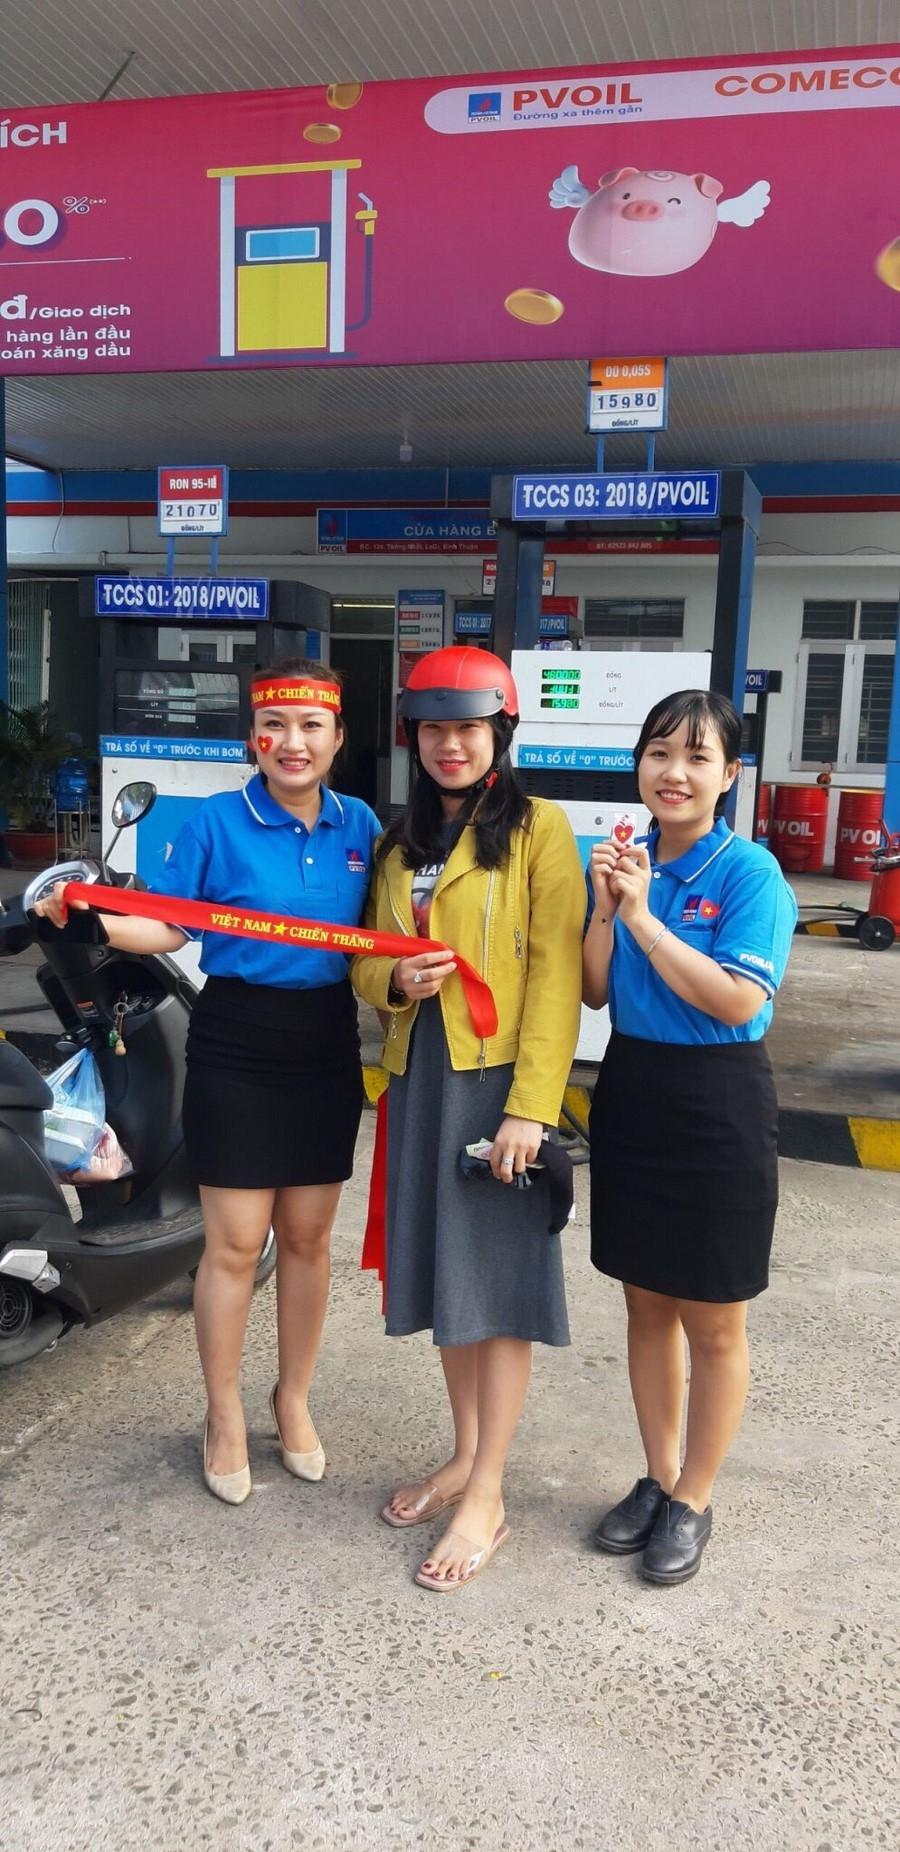 pvoil tham gia co vu tran chung ket bong da nam sea games 30